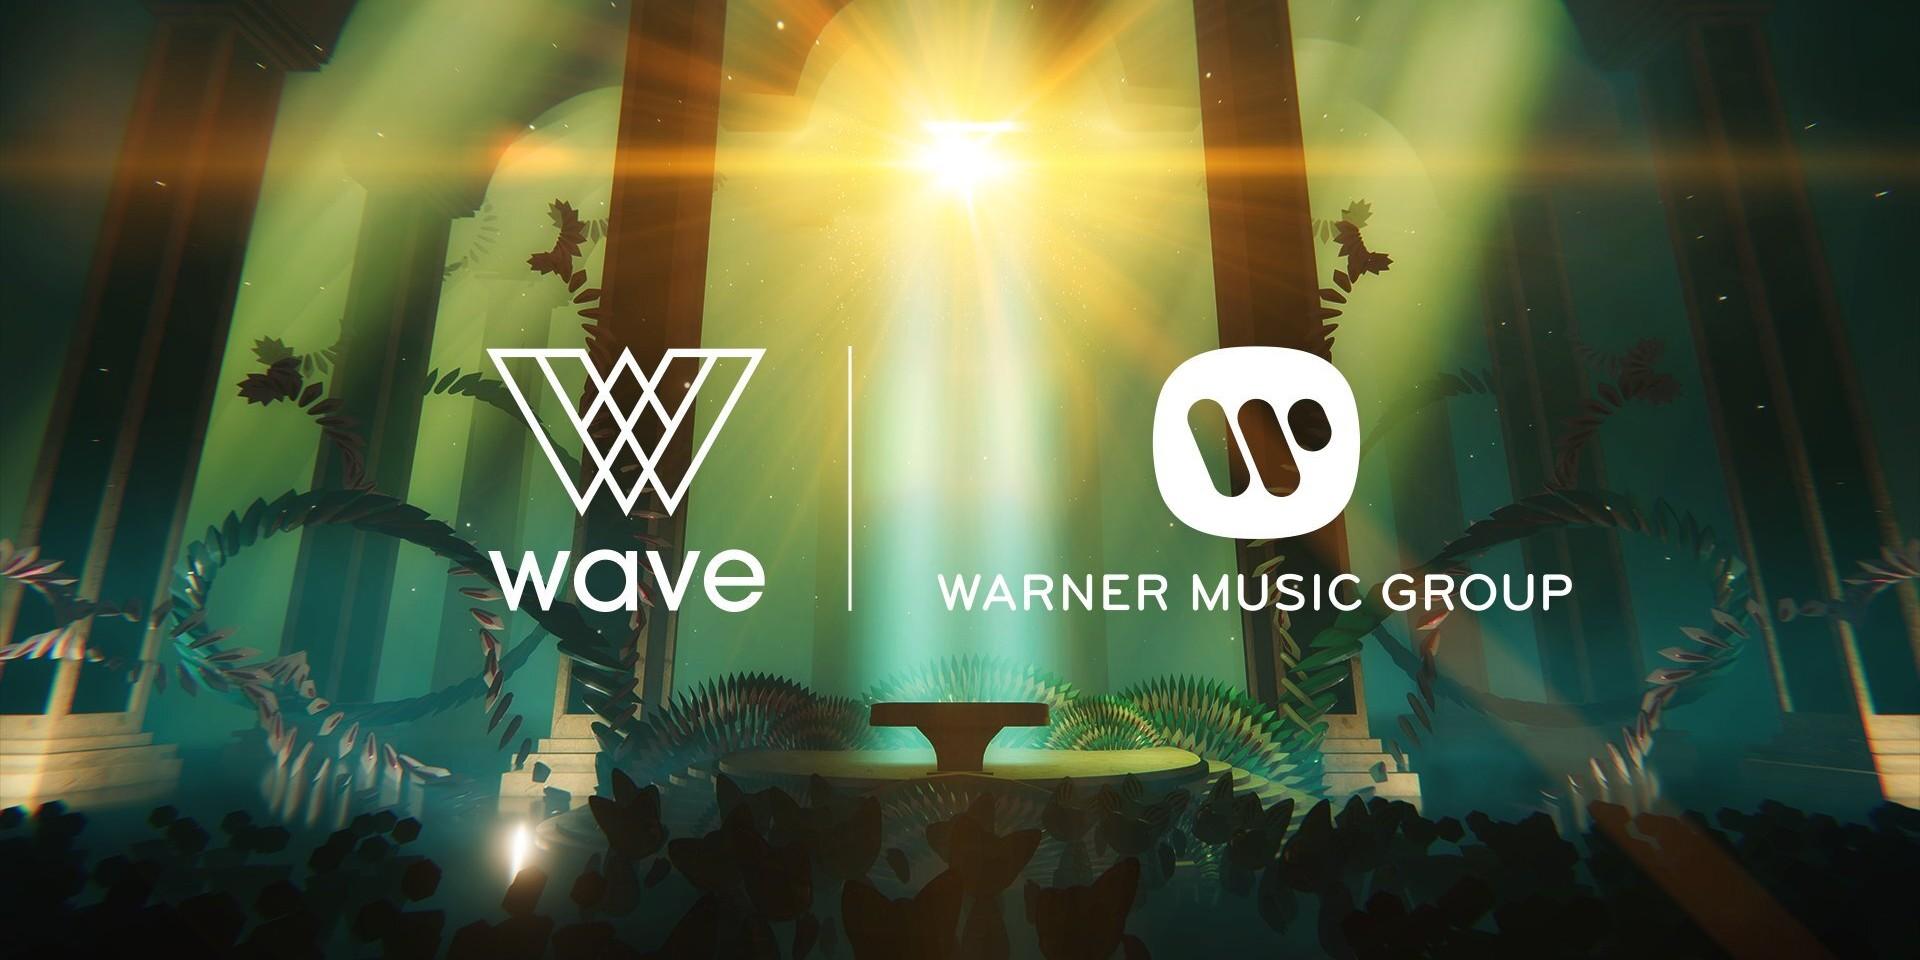 Warner Music Group strikes up partnership with virtual entertainment platform Wave